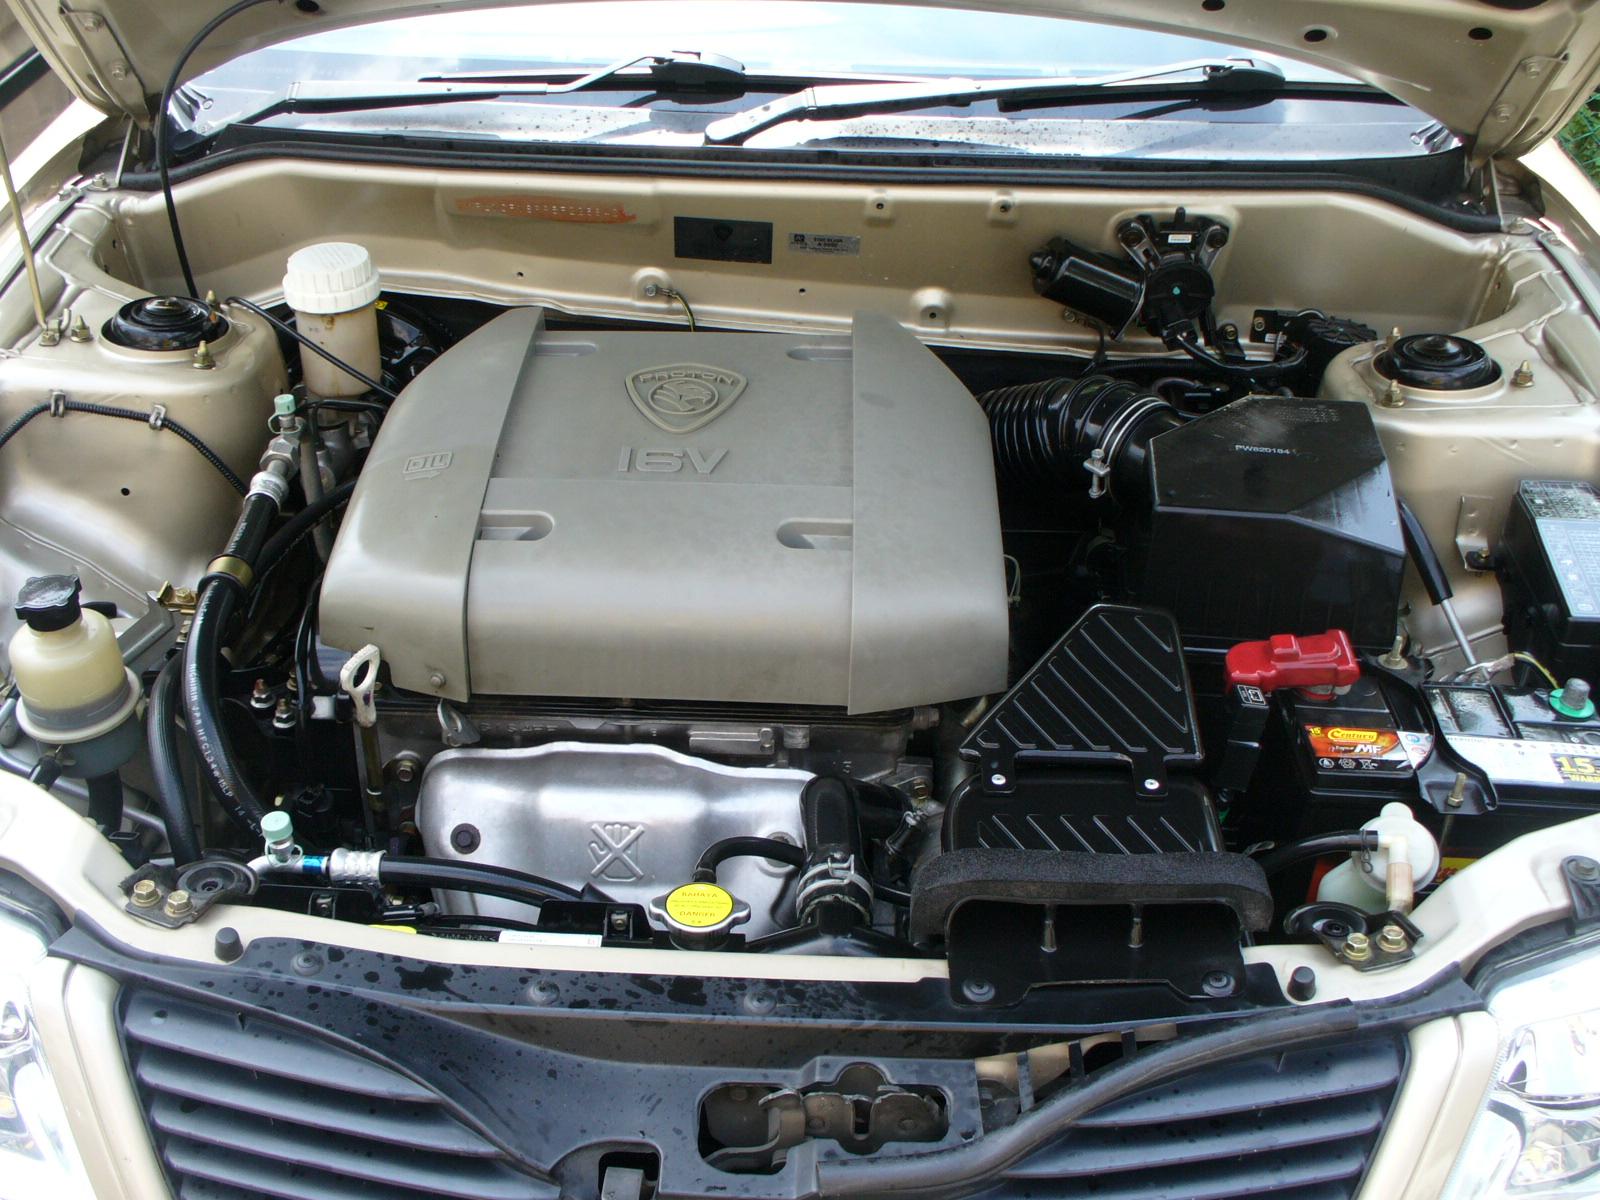 Proton Waja engine manual